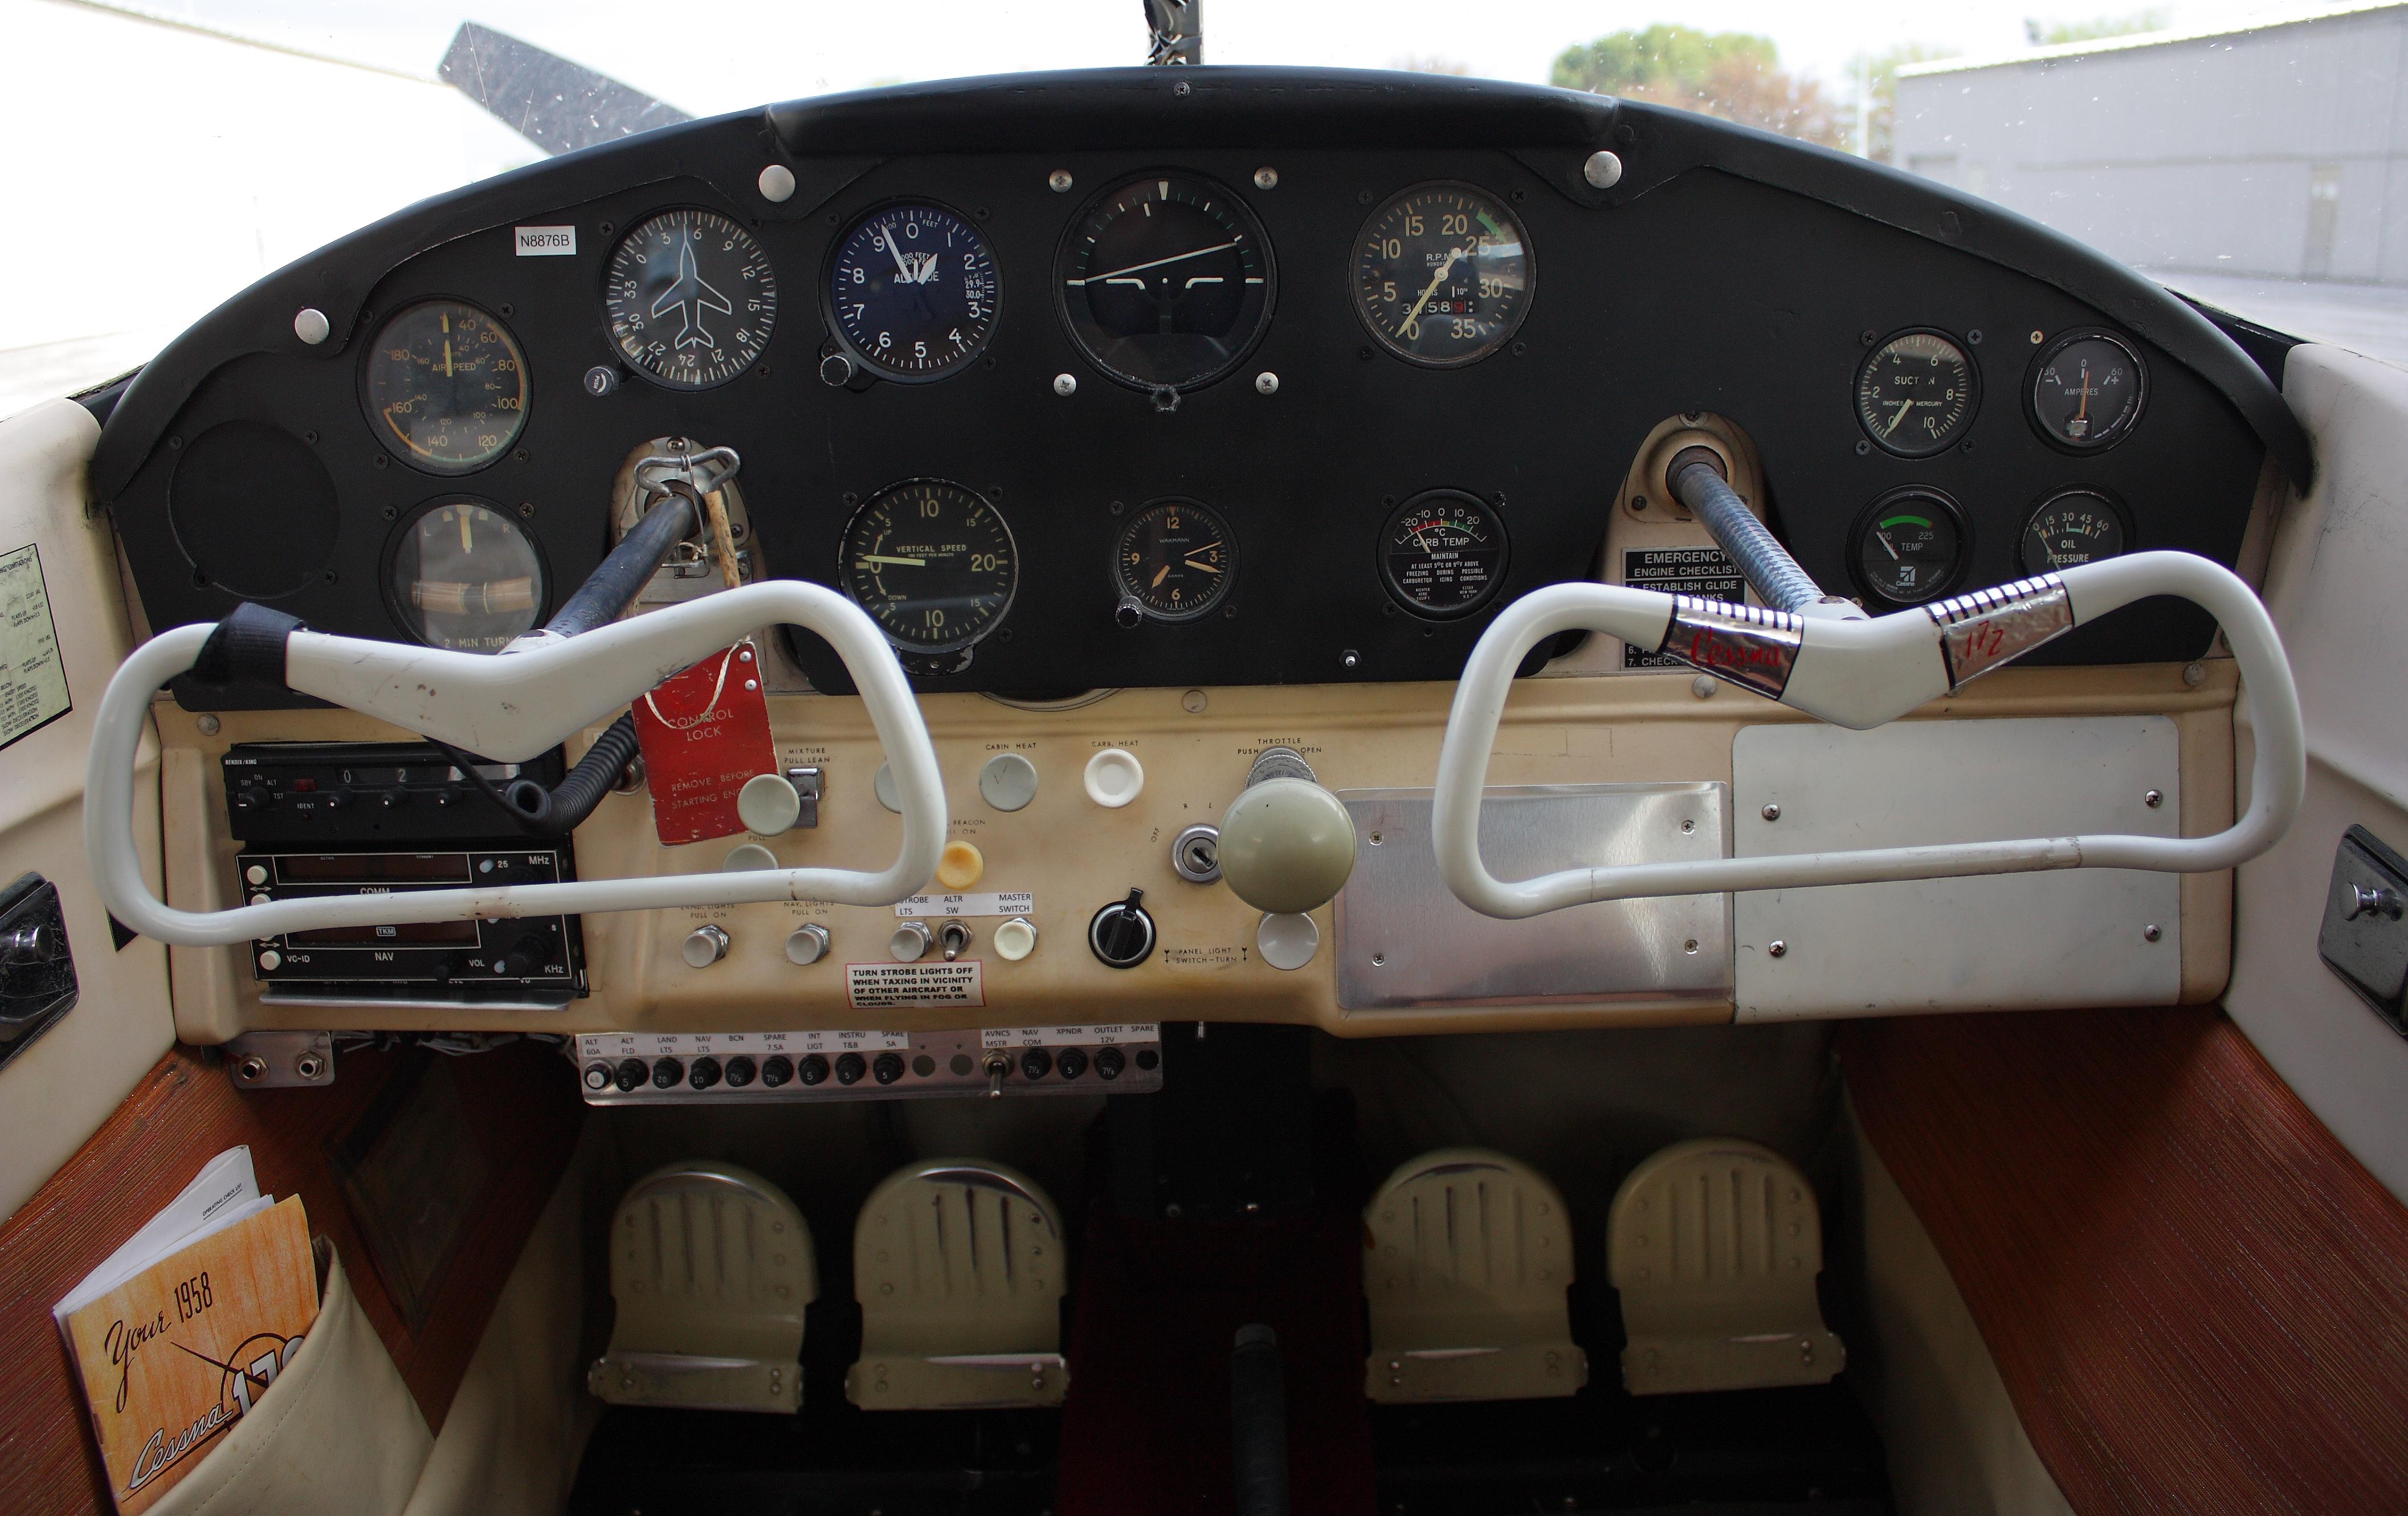 Simple VFR Panel